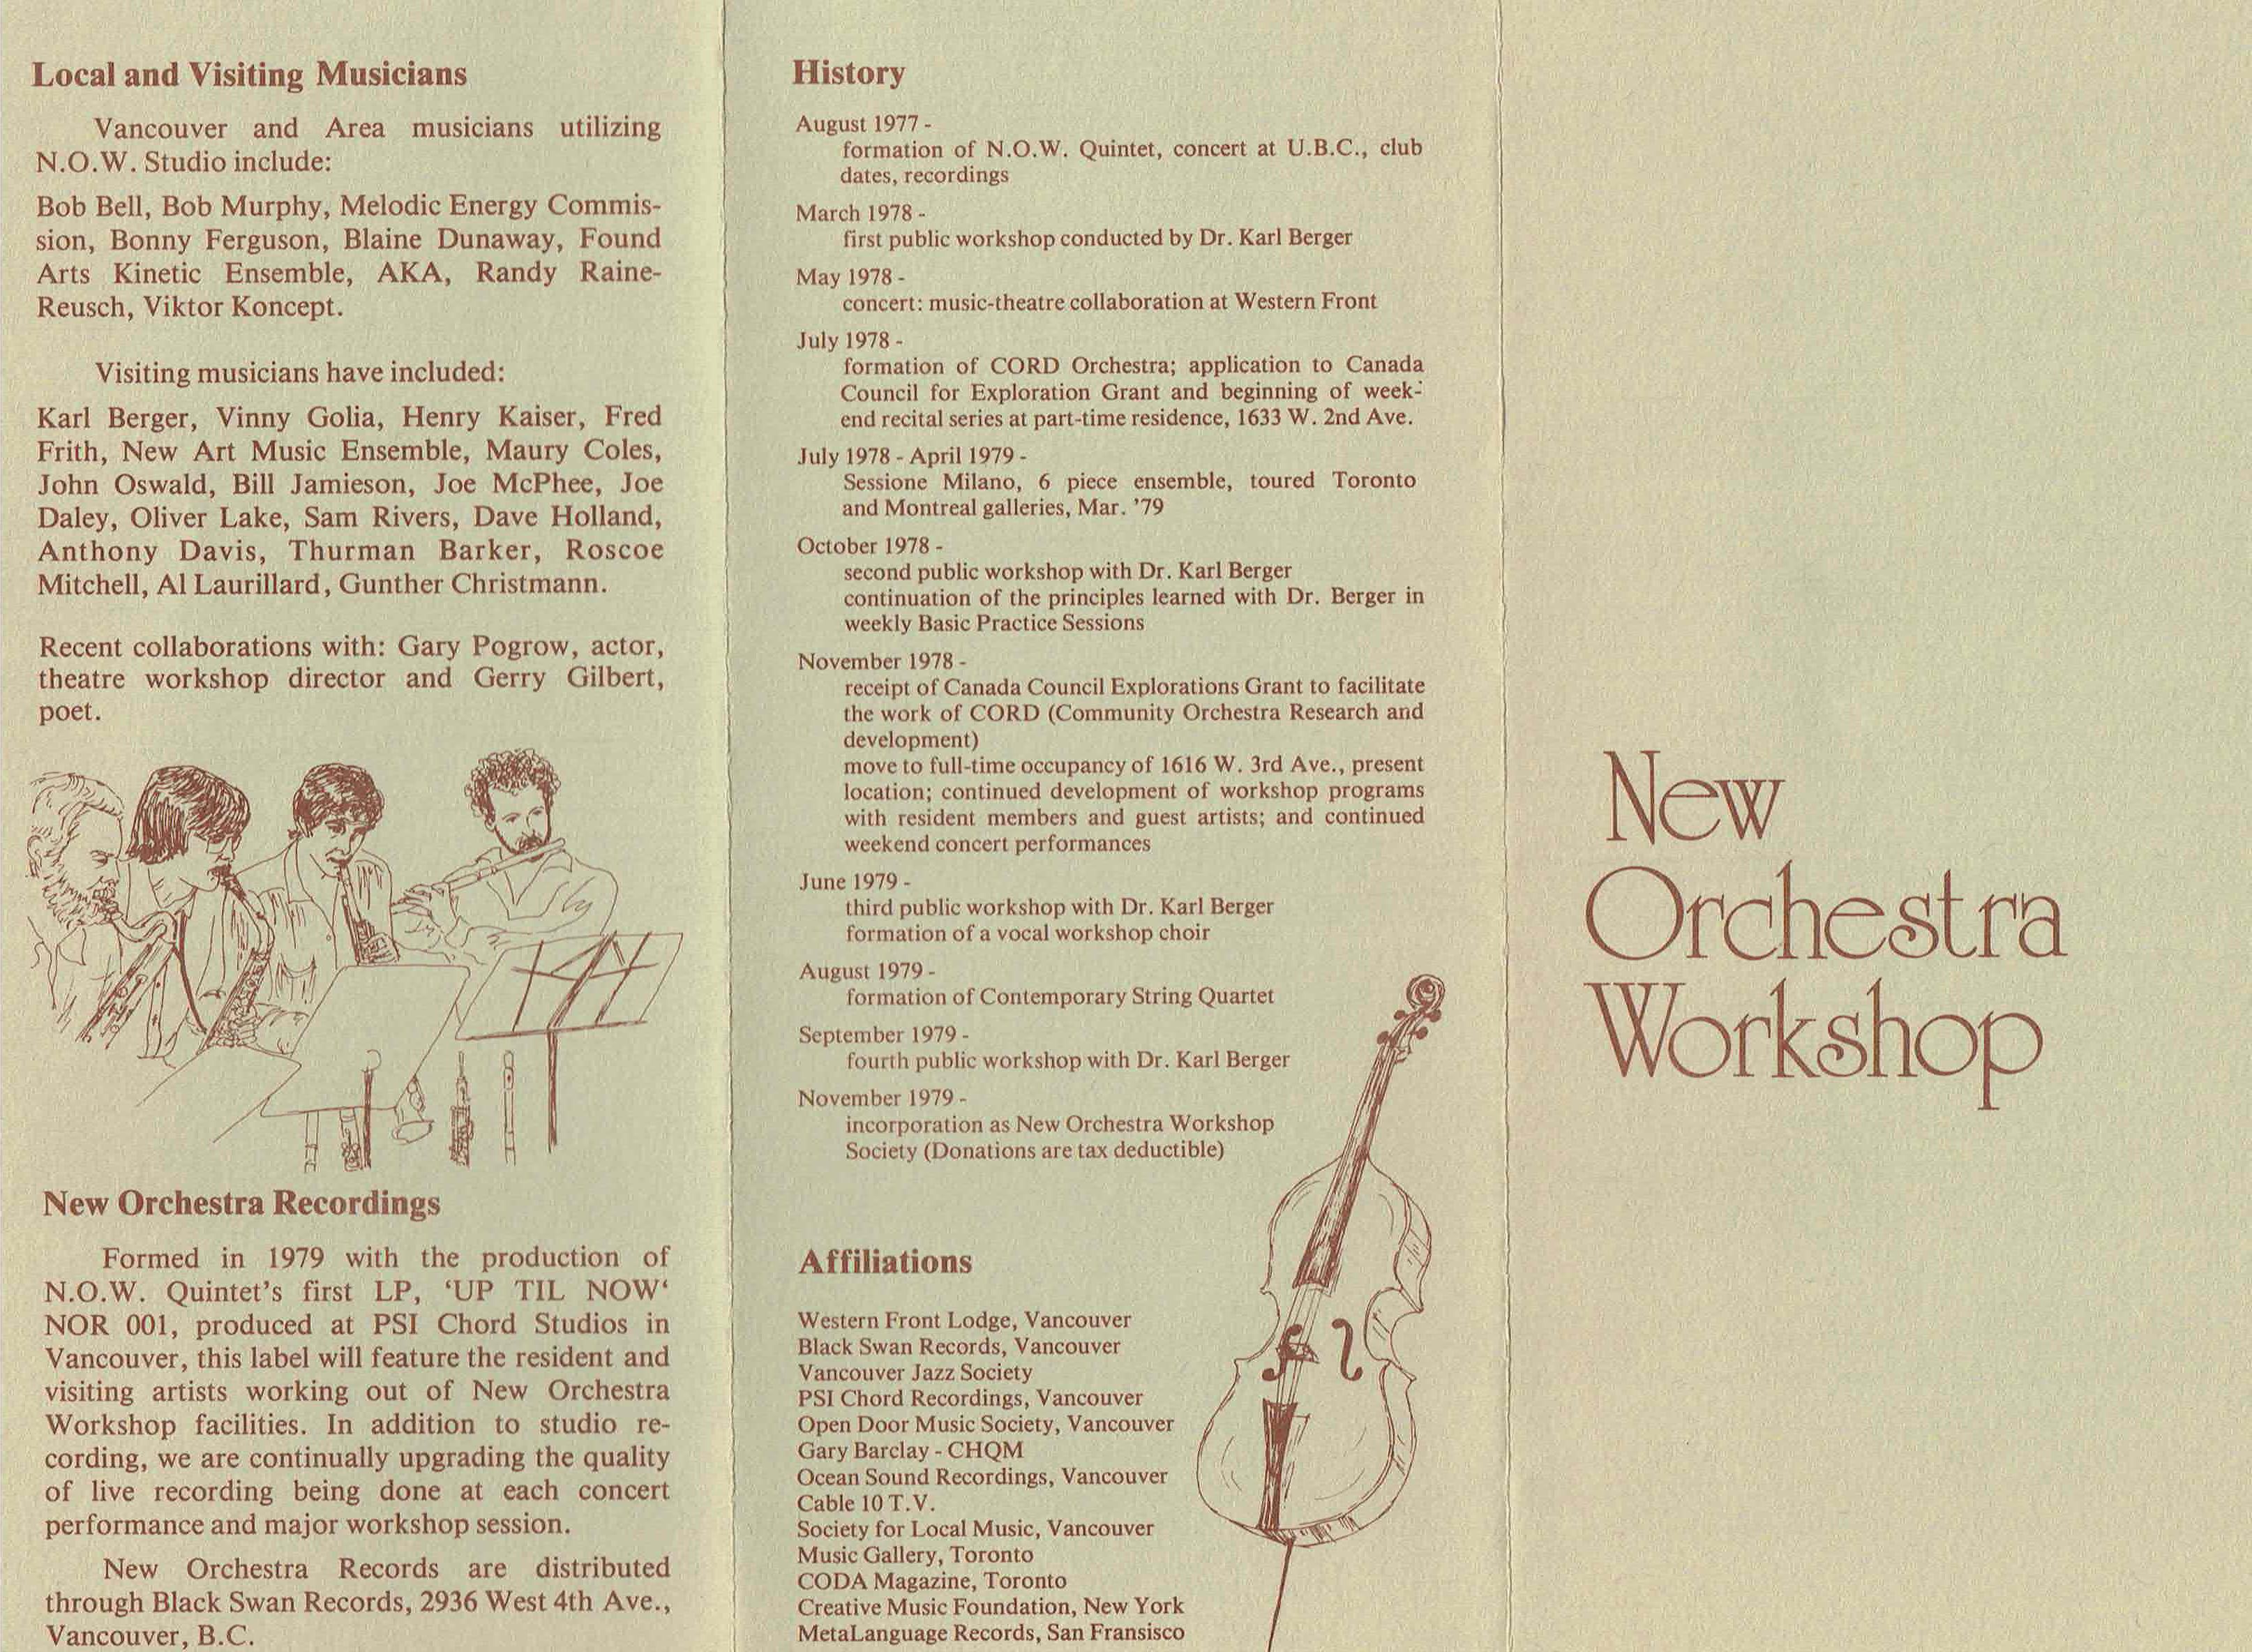 now_77_brochure.jpg